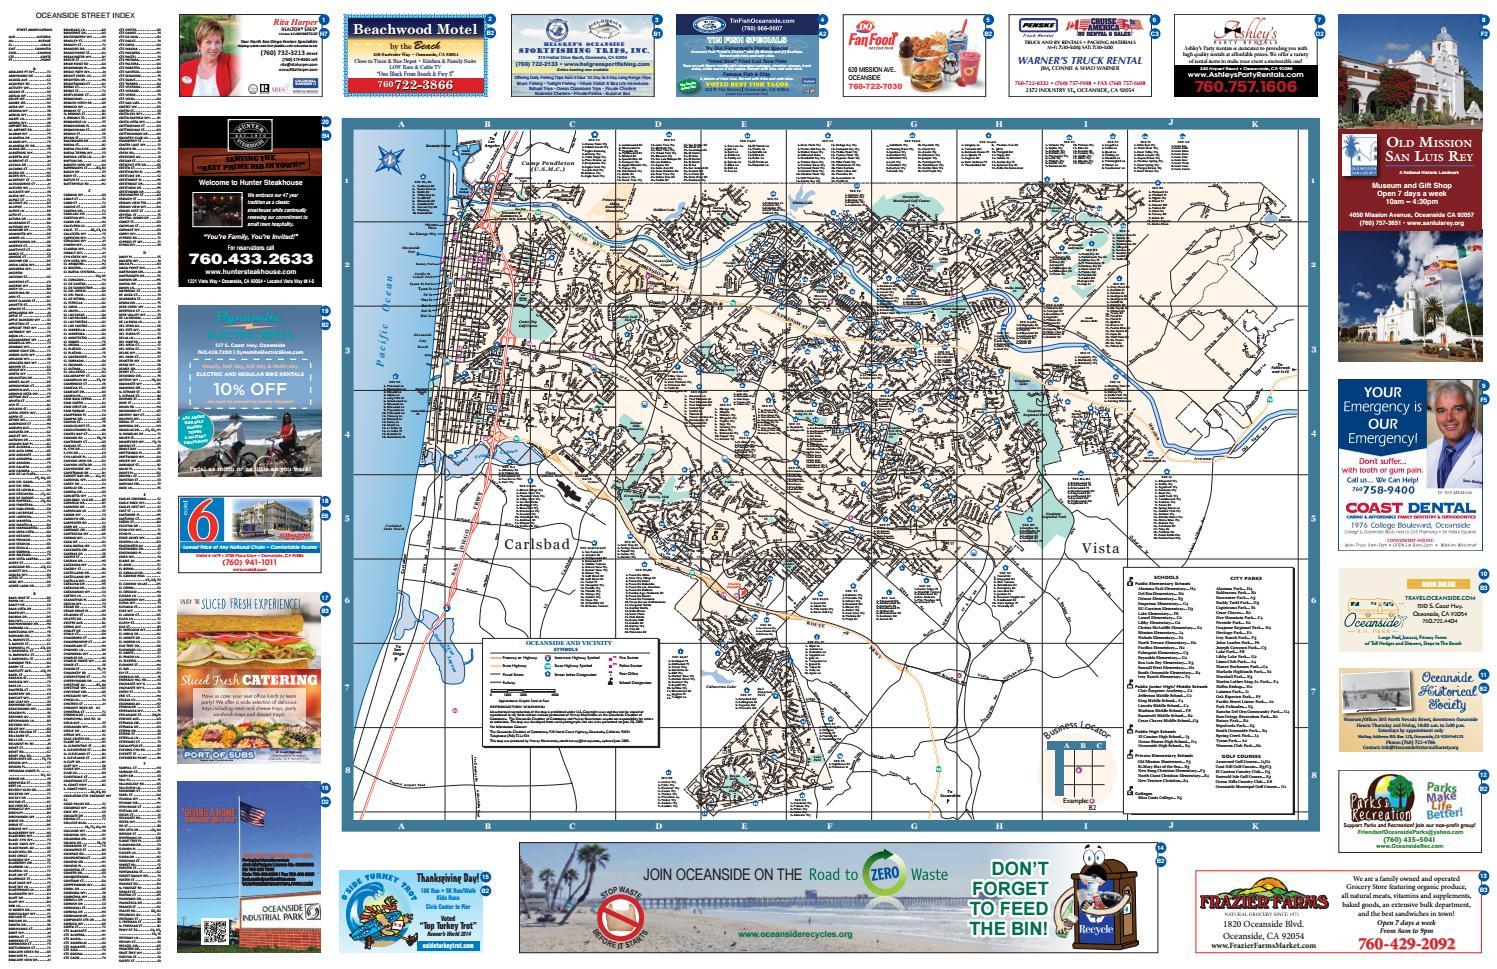 6b25099867c CITY OF OCEANSIDE FULL SIZE STREET VIEW MAP 2015-2017 by Oceanside ...